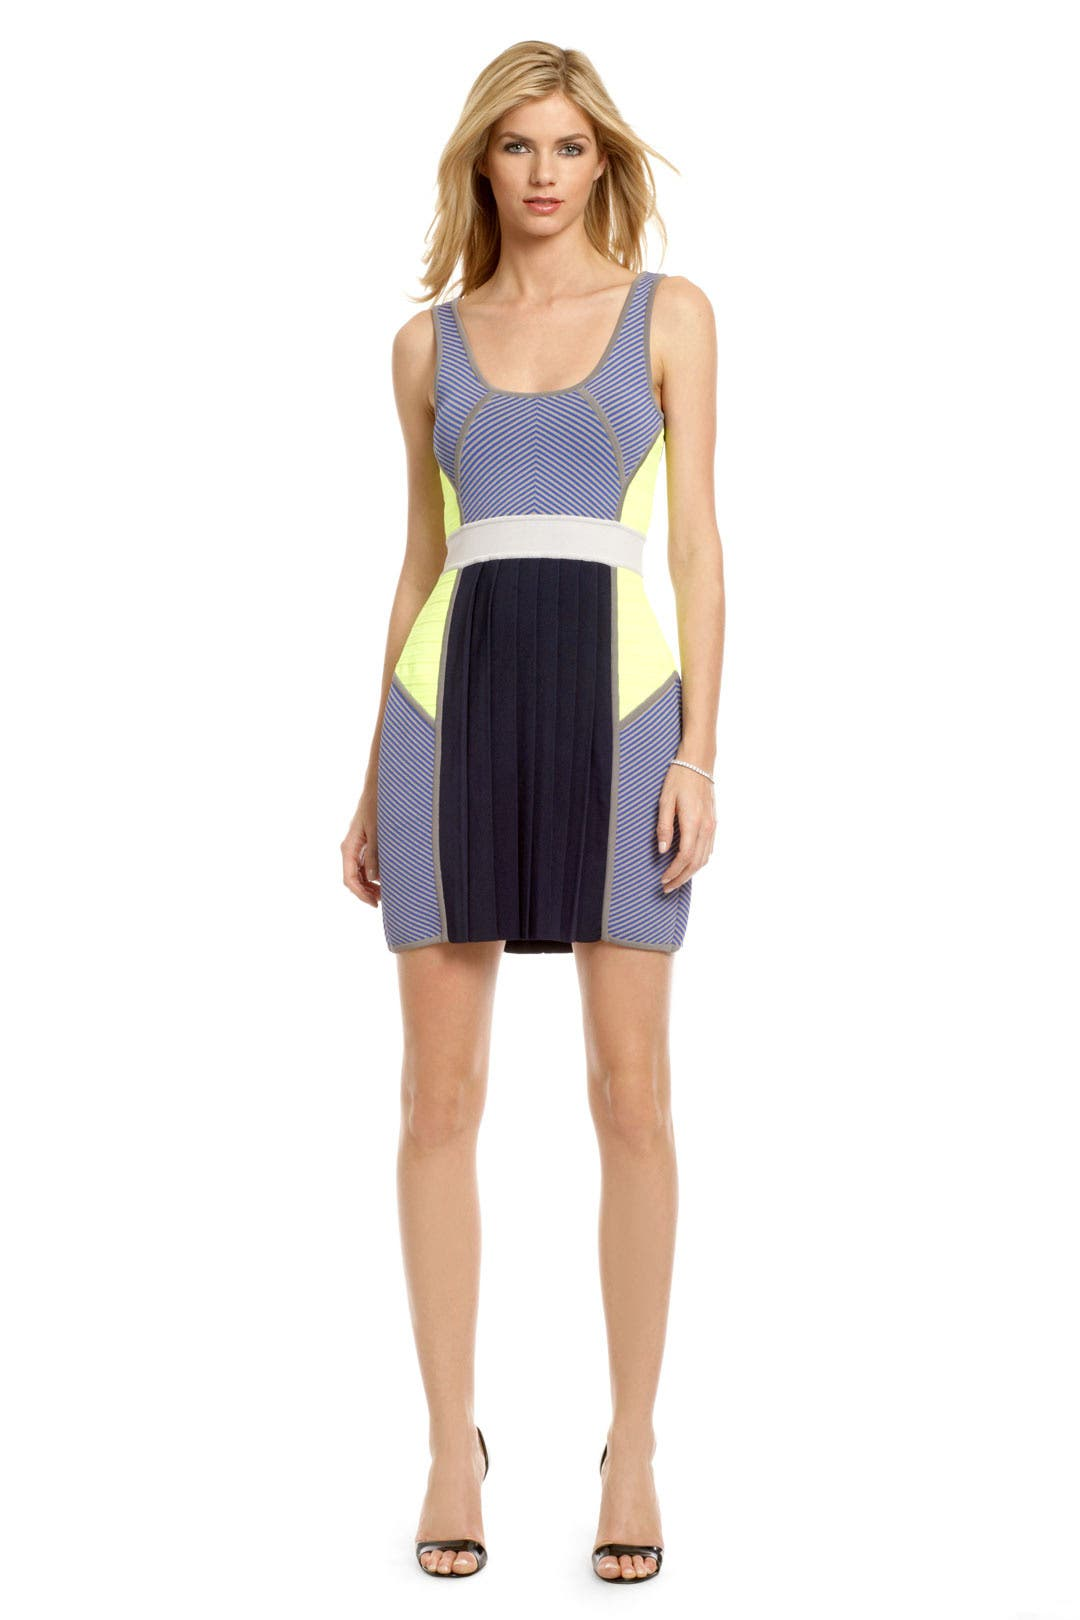 Wimbledon Pleat Dress by Cut 25